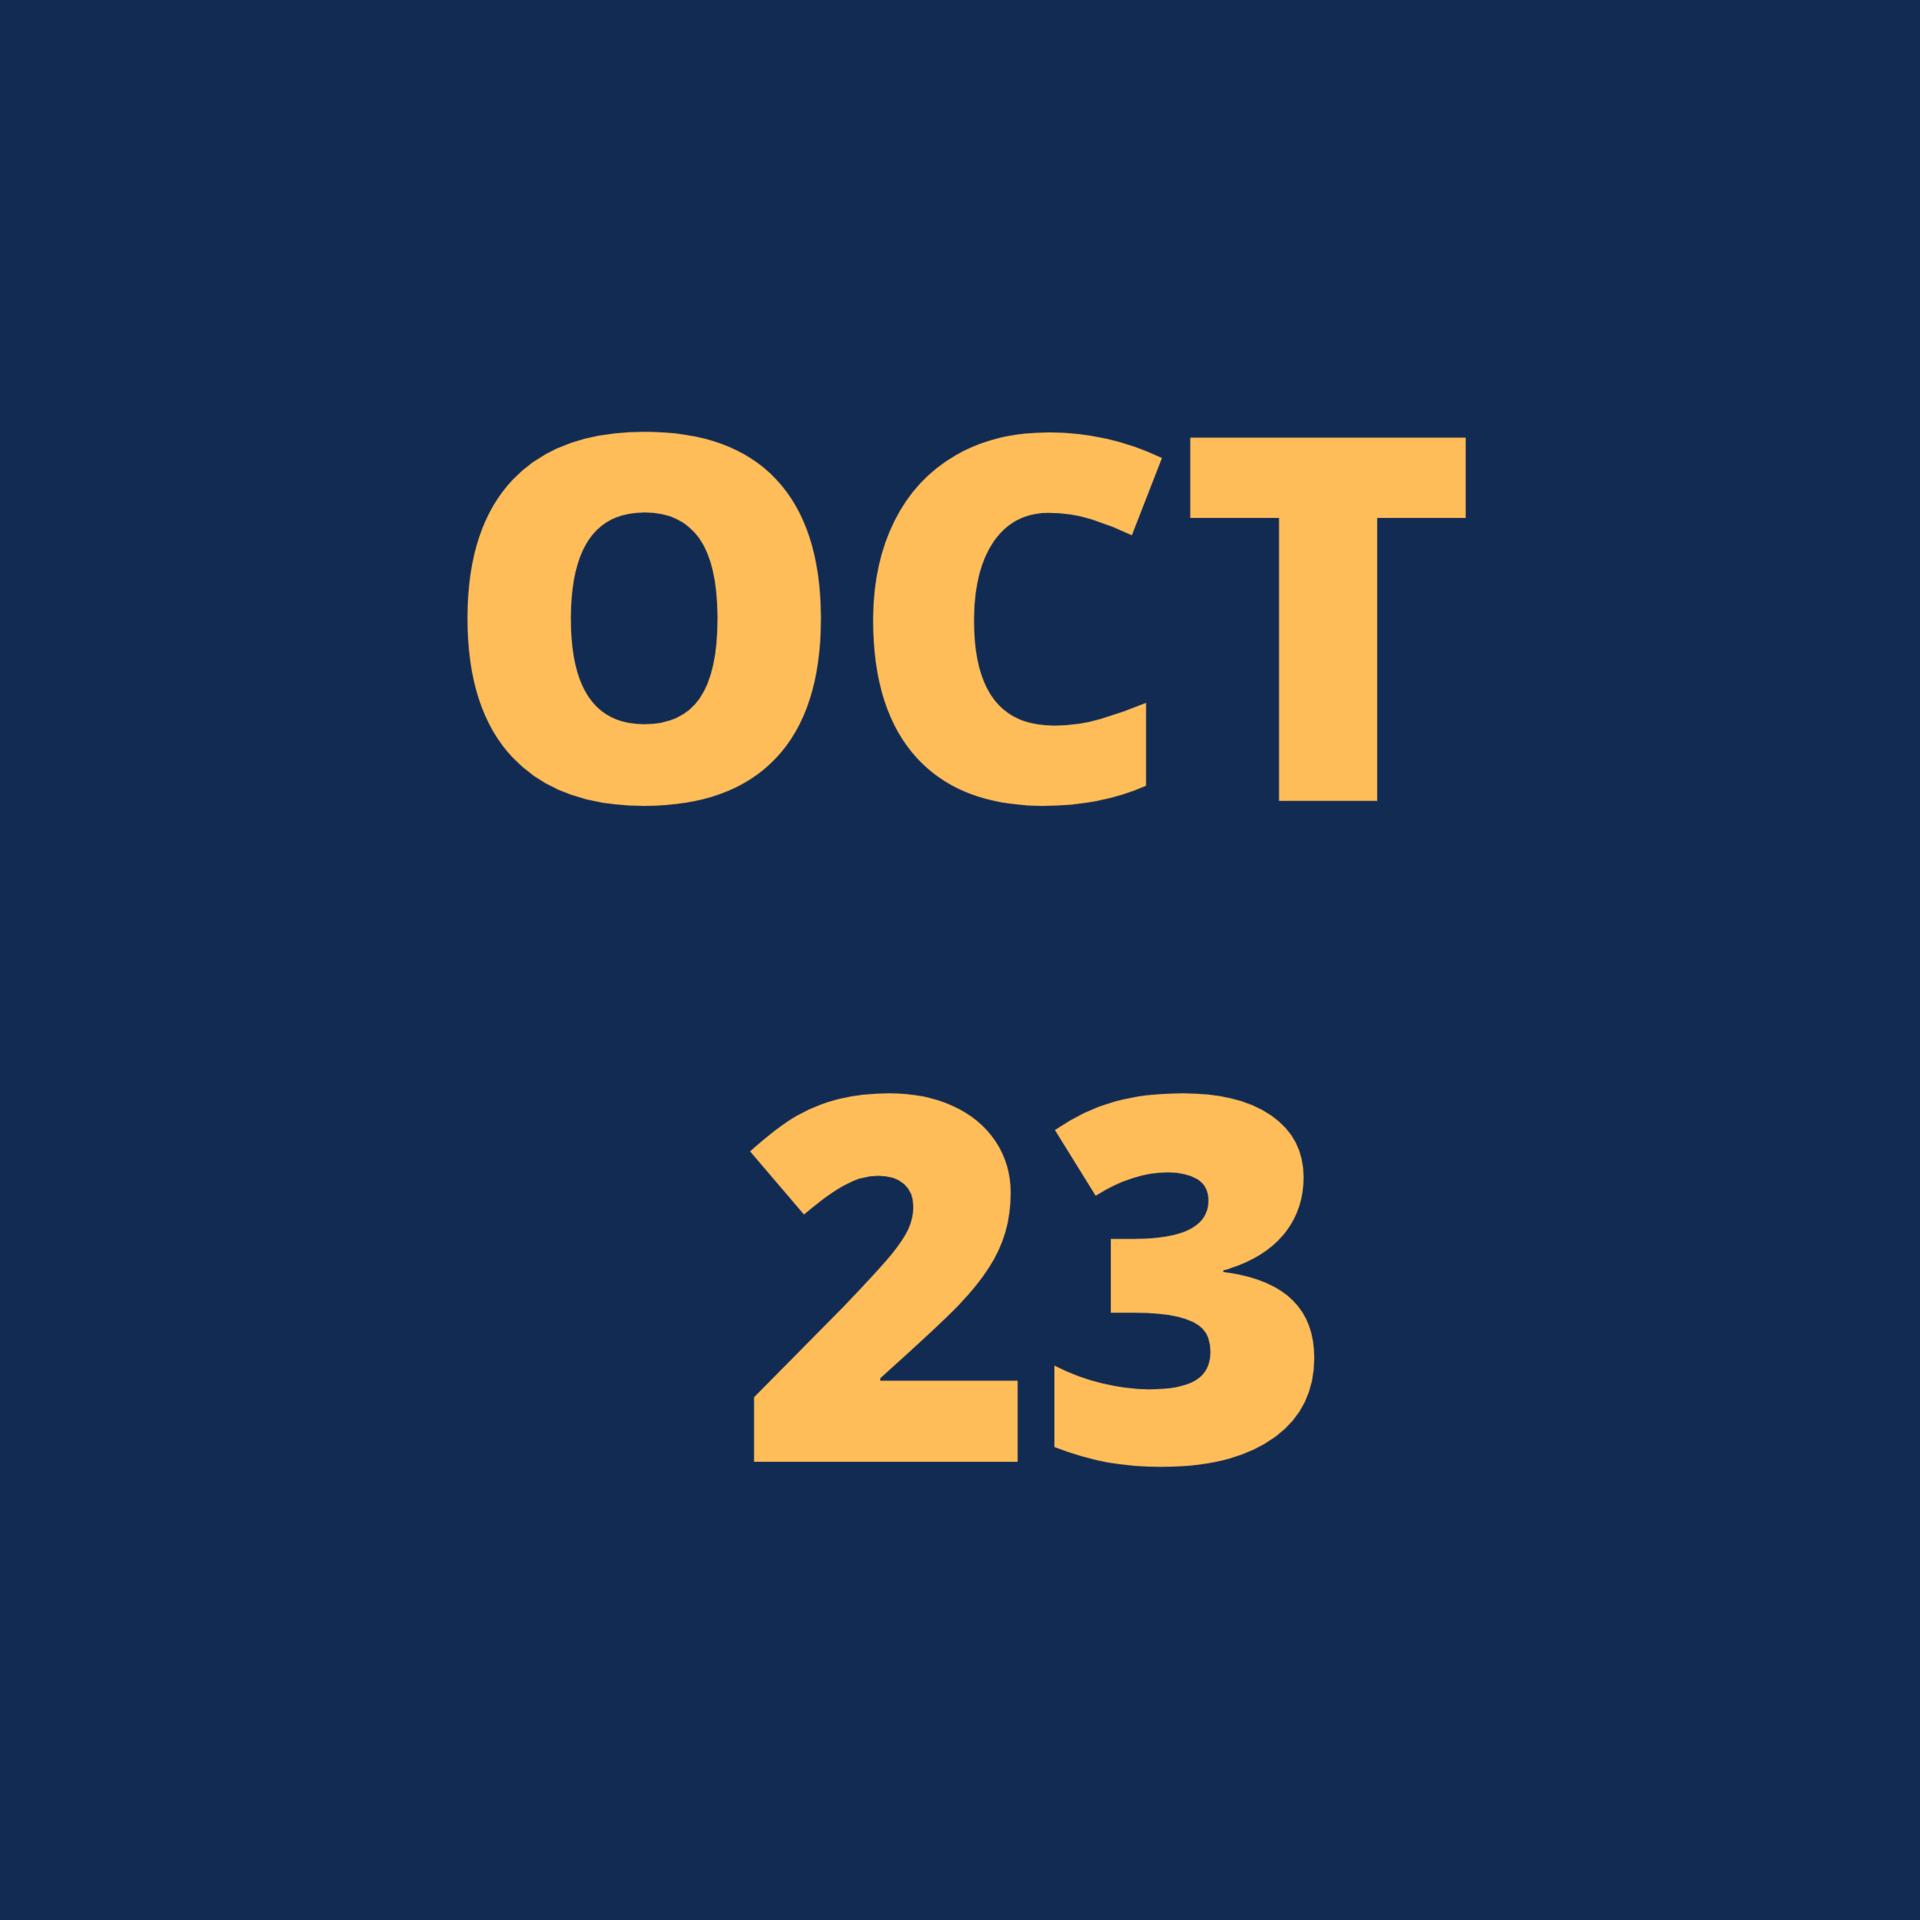 Oct 23 Icon